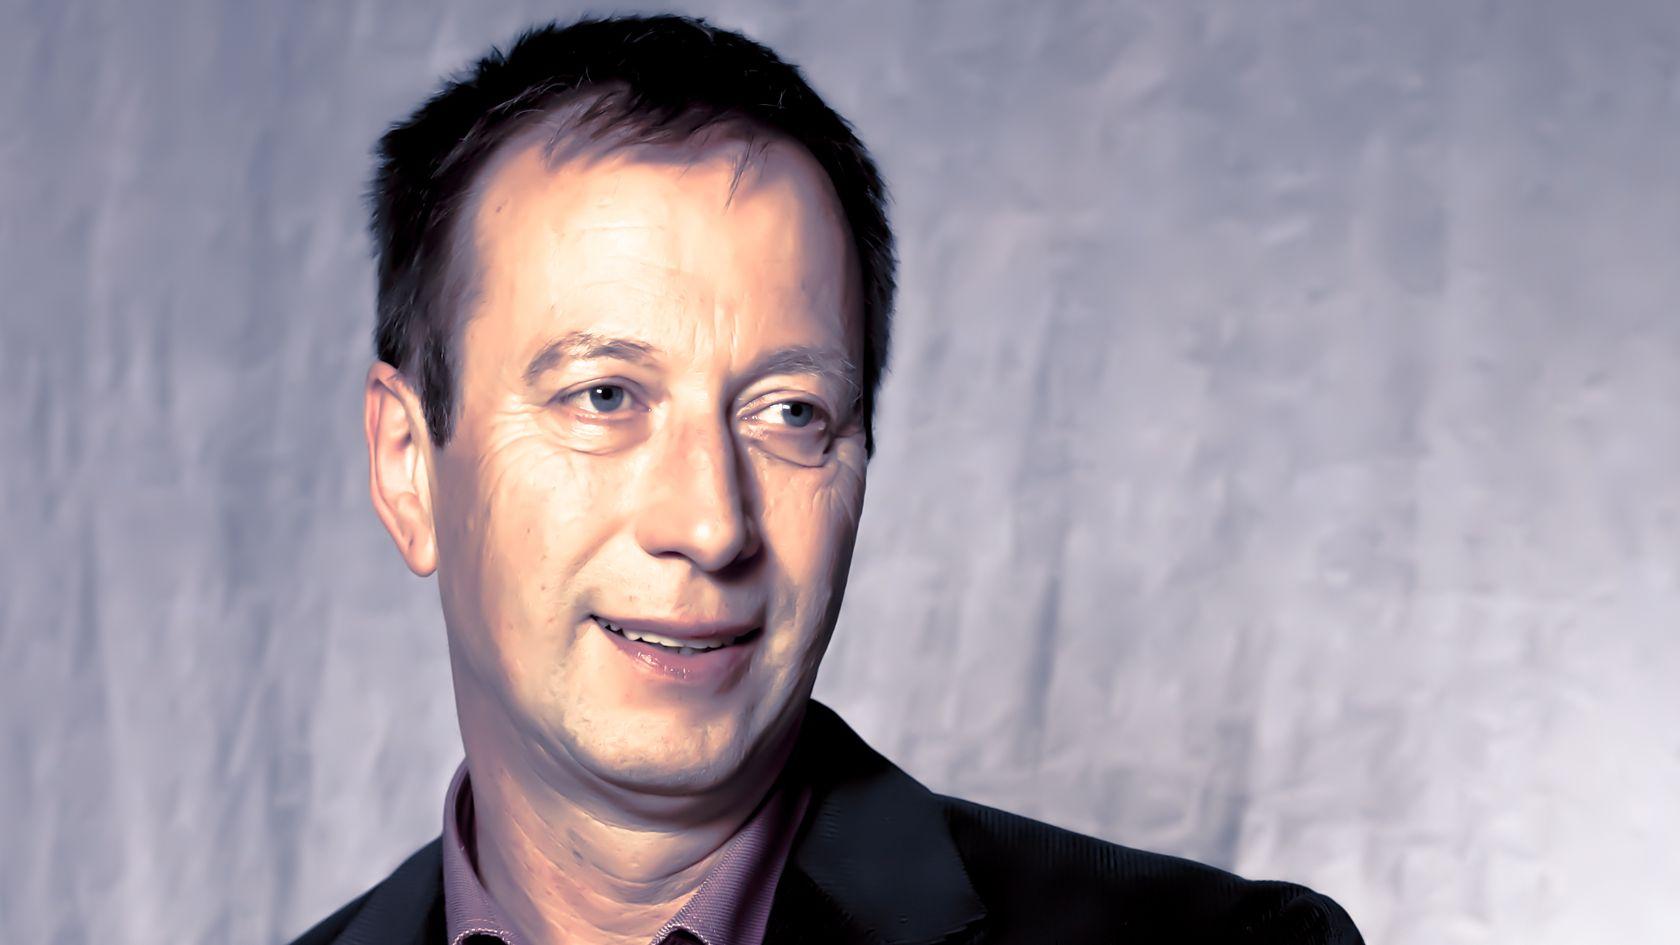 Schriftsteller Hans Pleschinski blickt lächelnd nach rechts aus dem Bild heraus